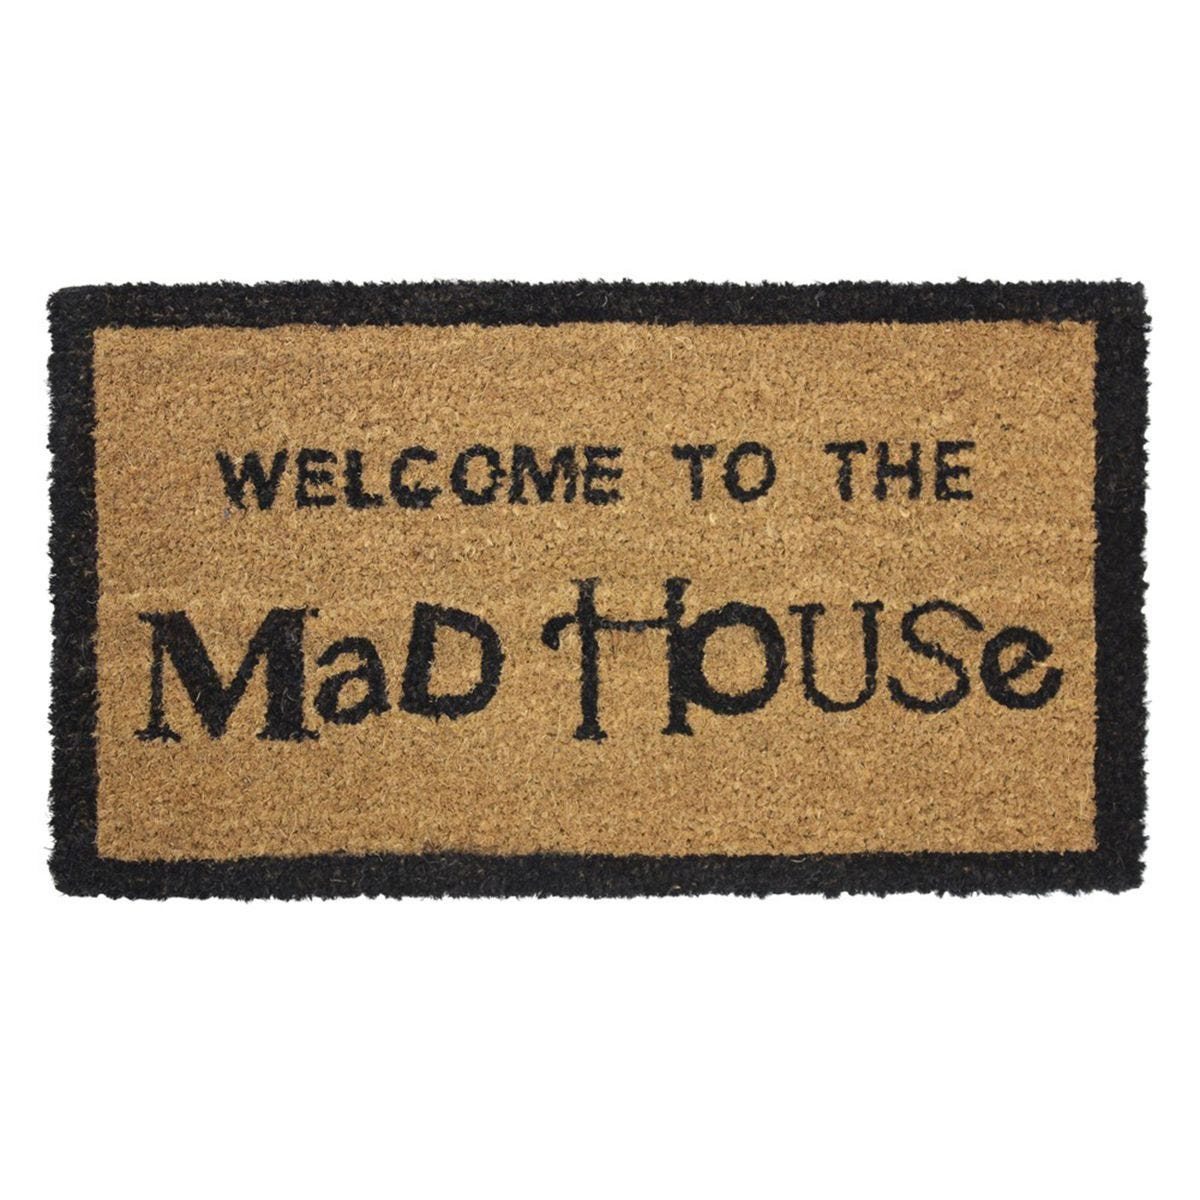 JVL 'Madhouse' Entrance Doormat - 33.5x60cm